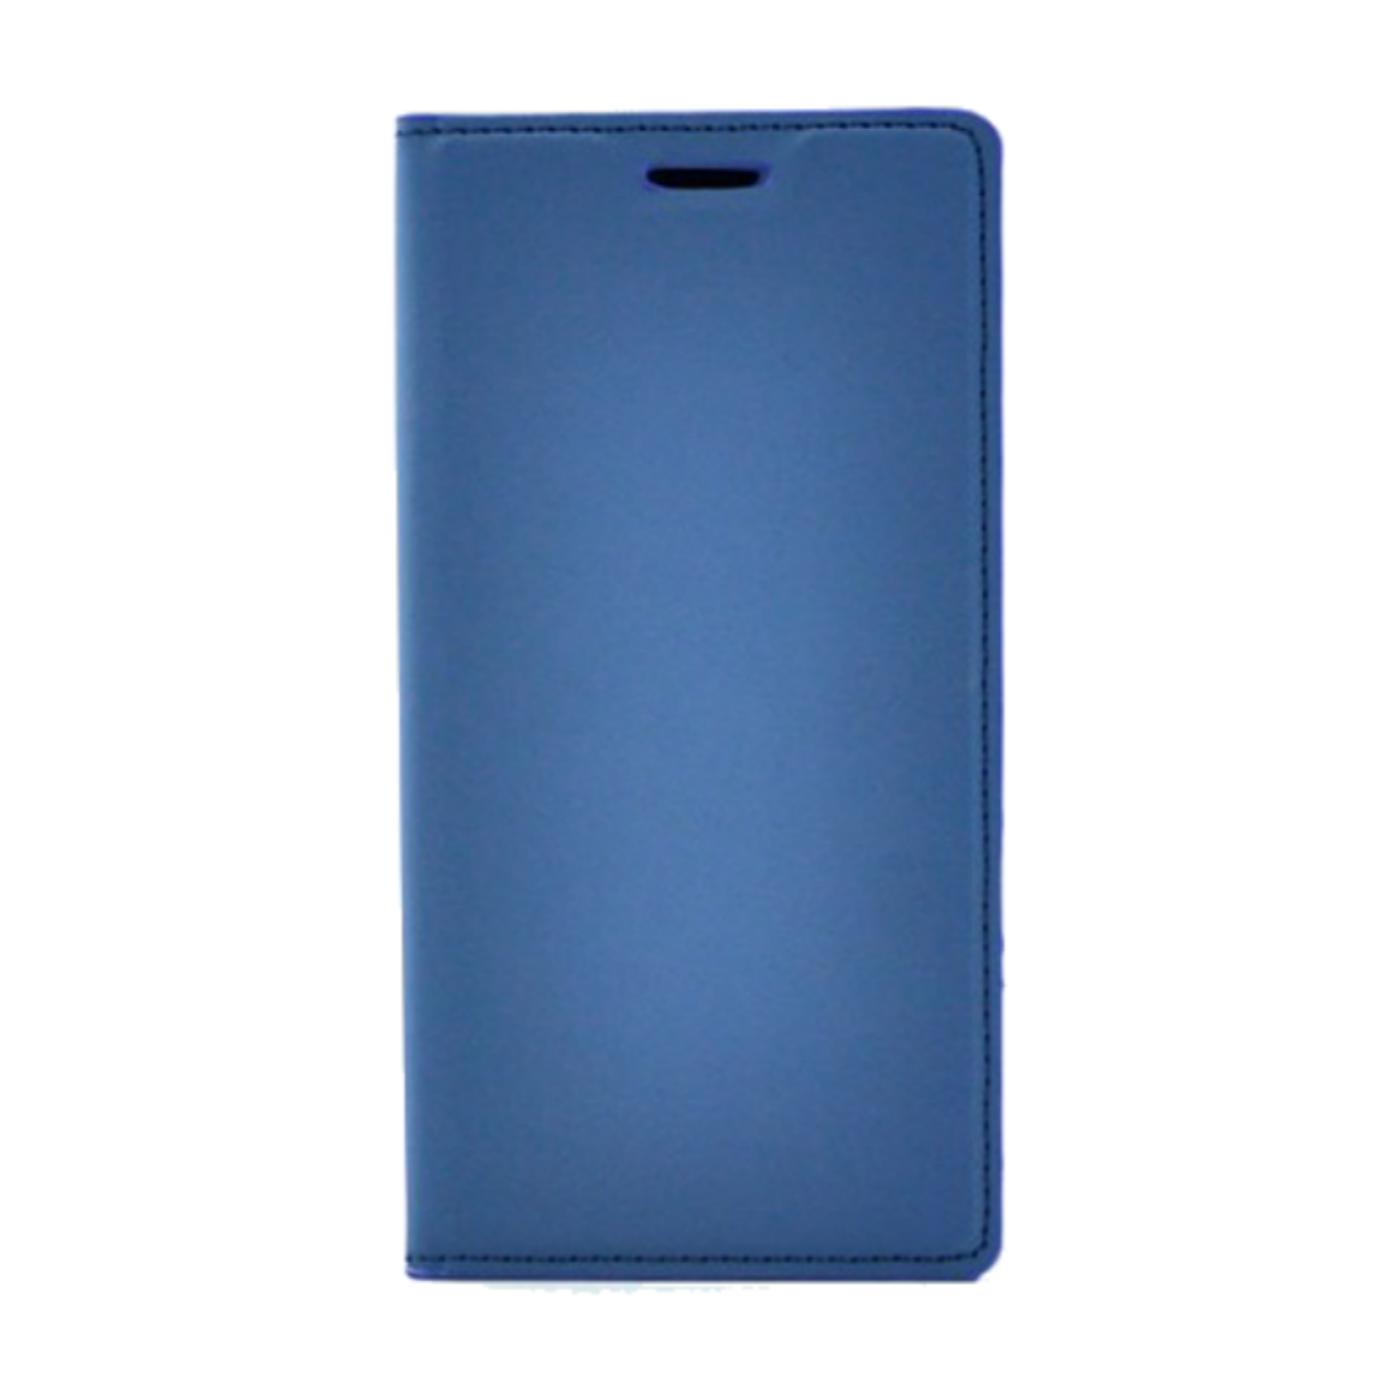 Futrola za mobitel Huawei Y6, plava